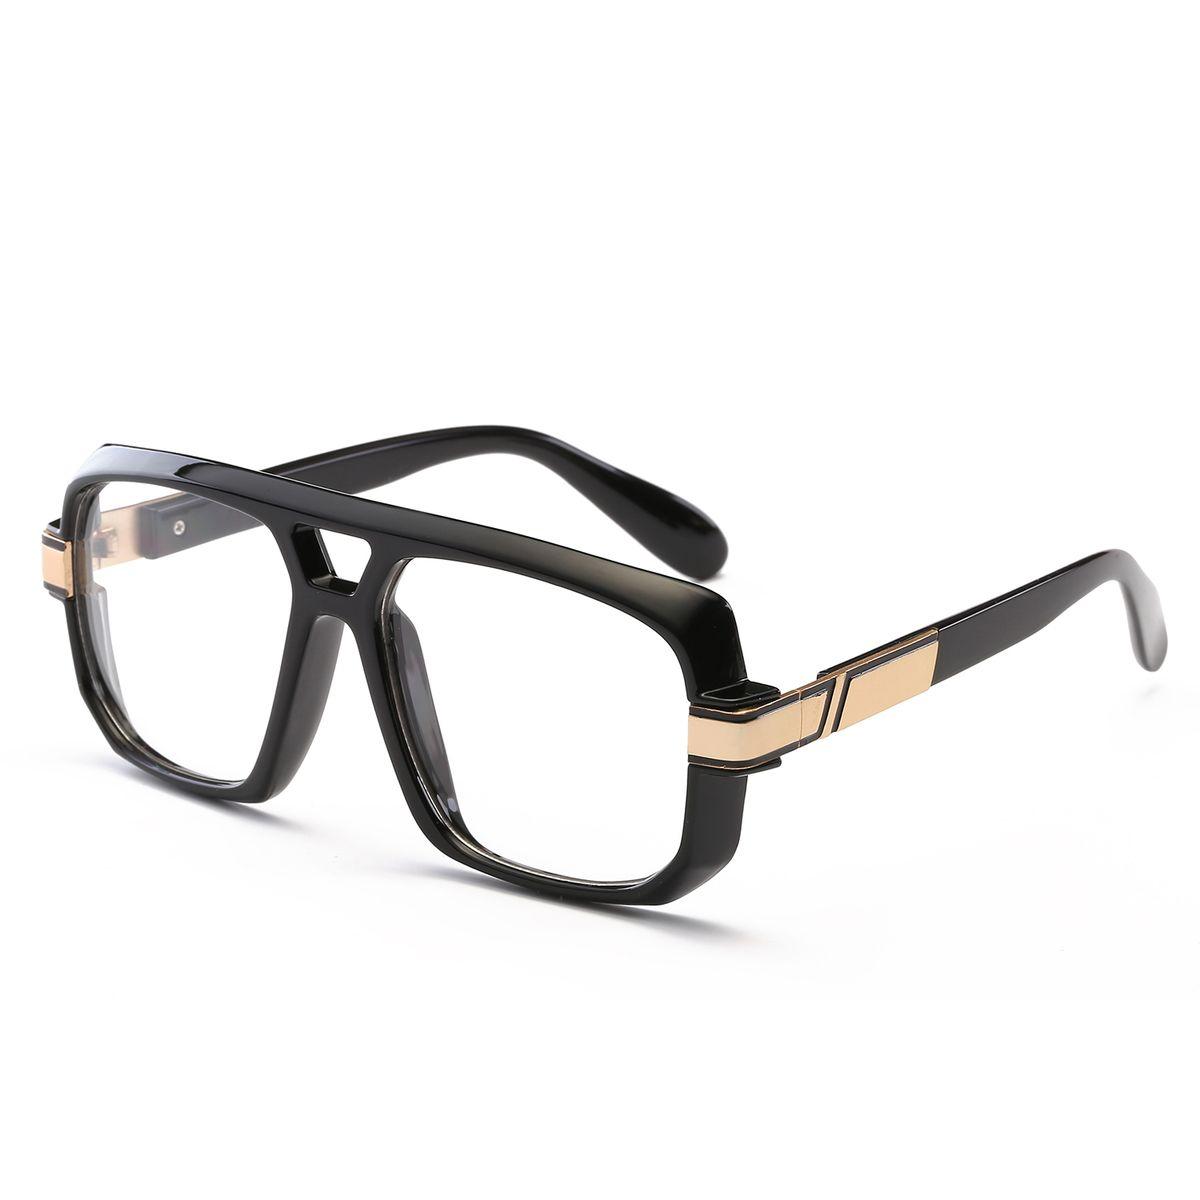 8d12aa6f629030 SIPU 2017 New Square Hip Hop Fashion Brand Designer Sunglasses Men Women  Mirror Sun glasses Lady Flat Oversized size Eyeglasses